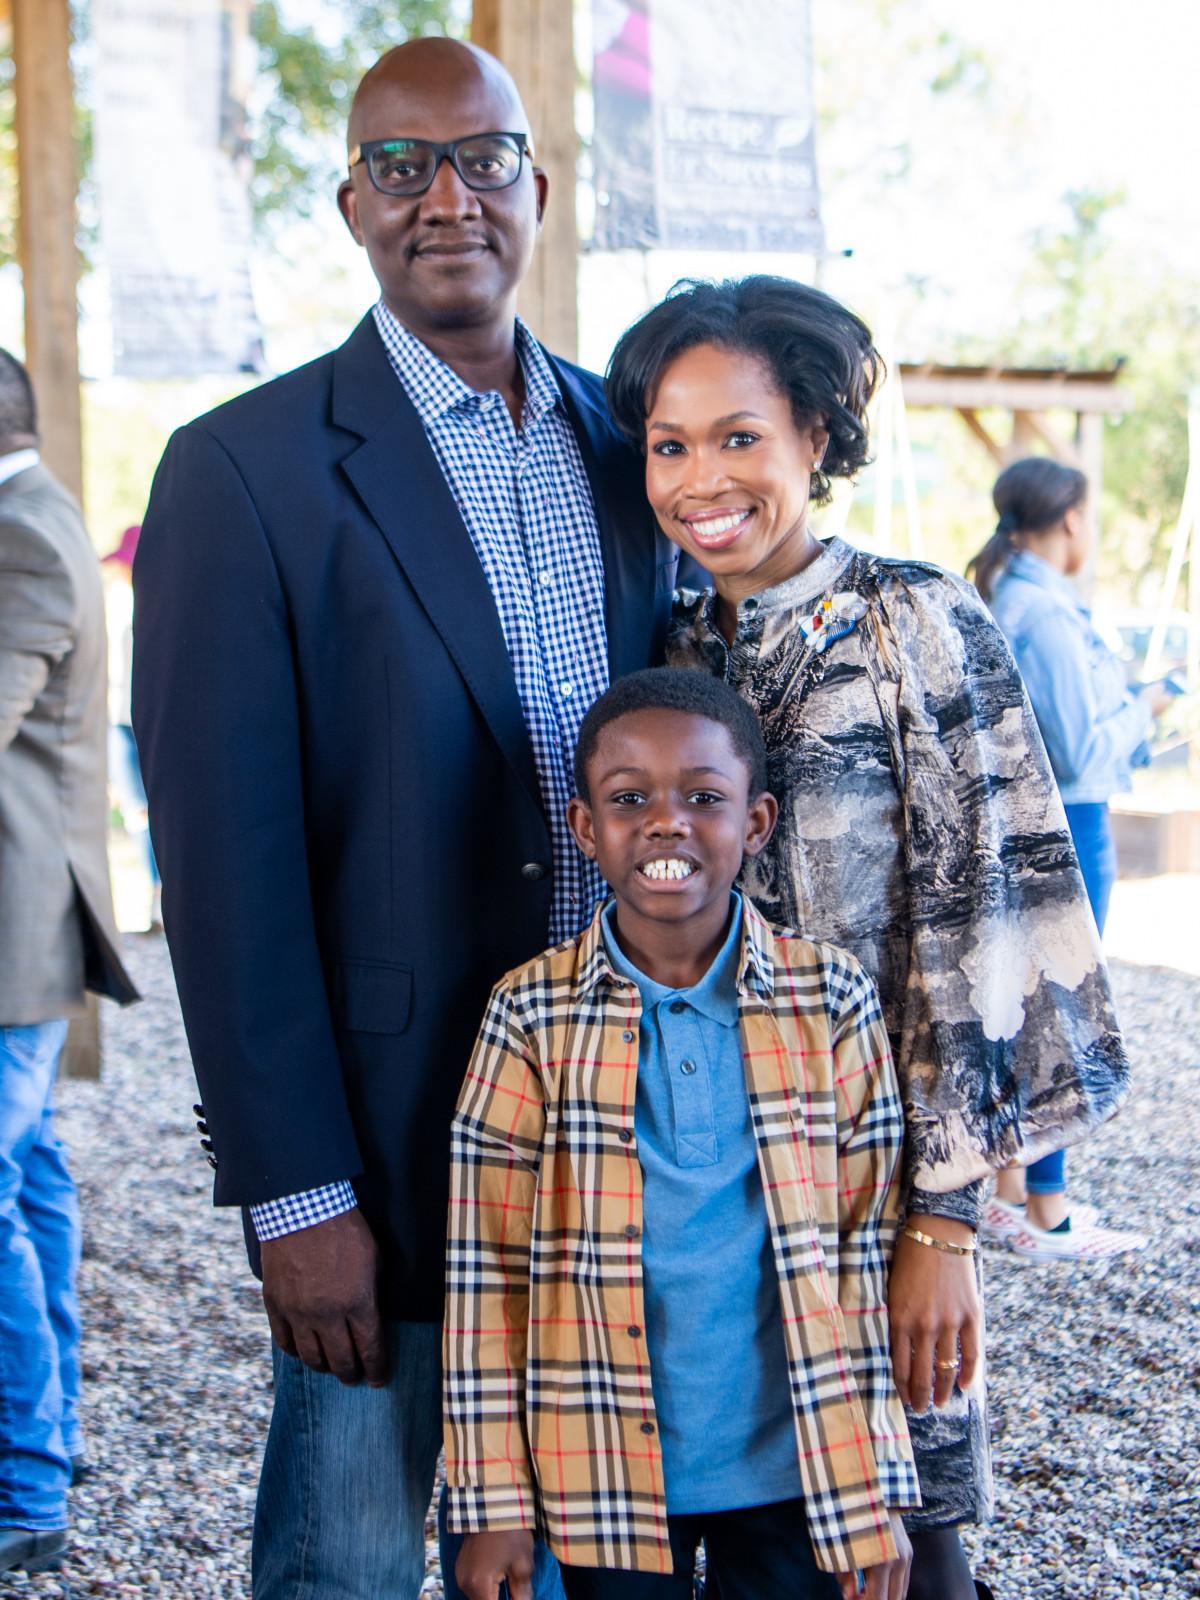 Fashion in the Fields 2019  Derrick Mitchell & Roslyn Bazelle Mitchell with son Derrick Mitchell_0172_RFSFashionInTheField_111019_MCW.jpg